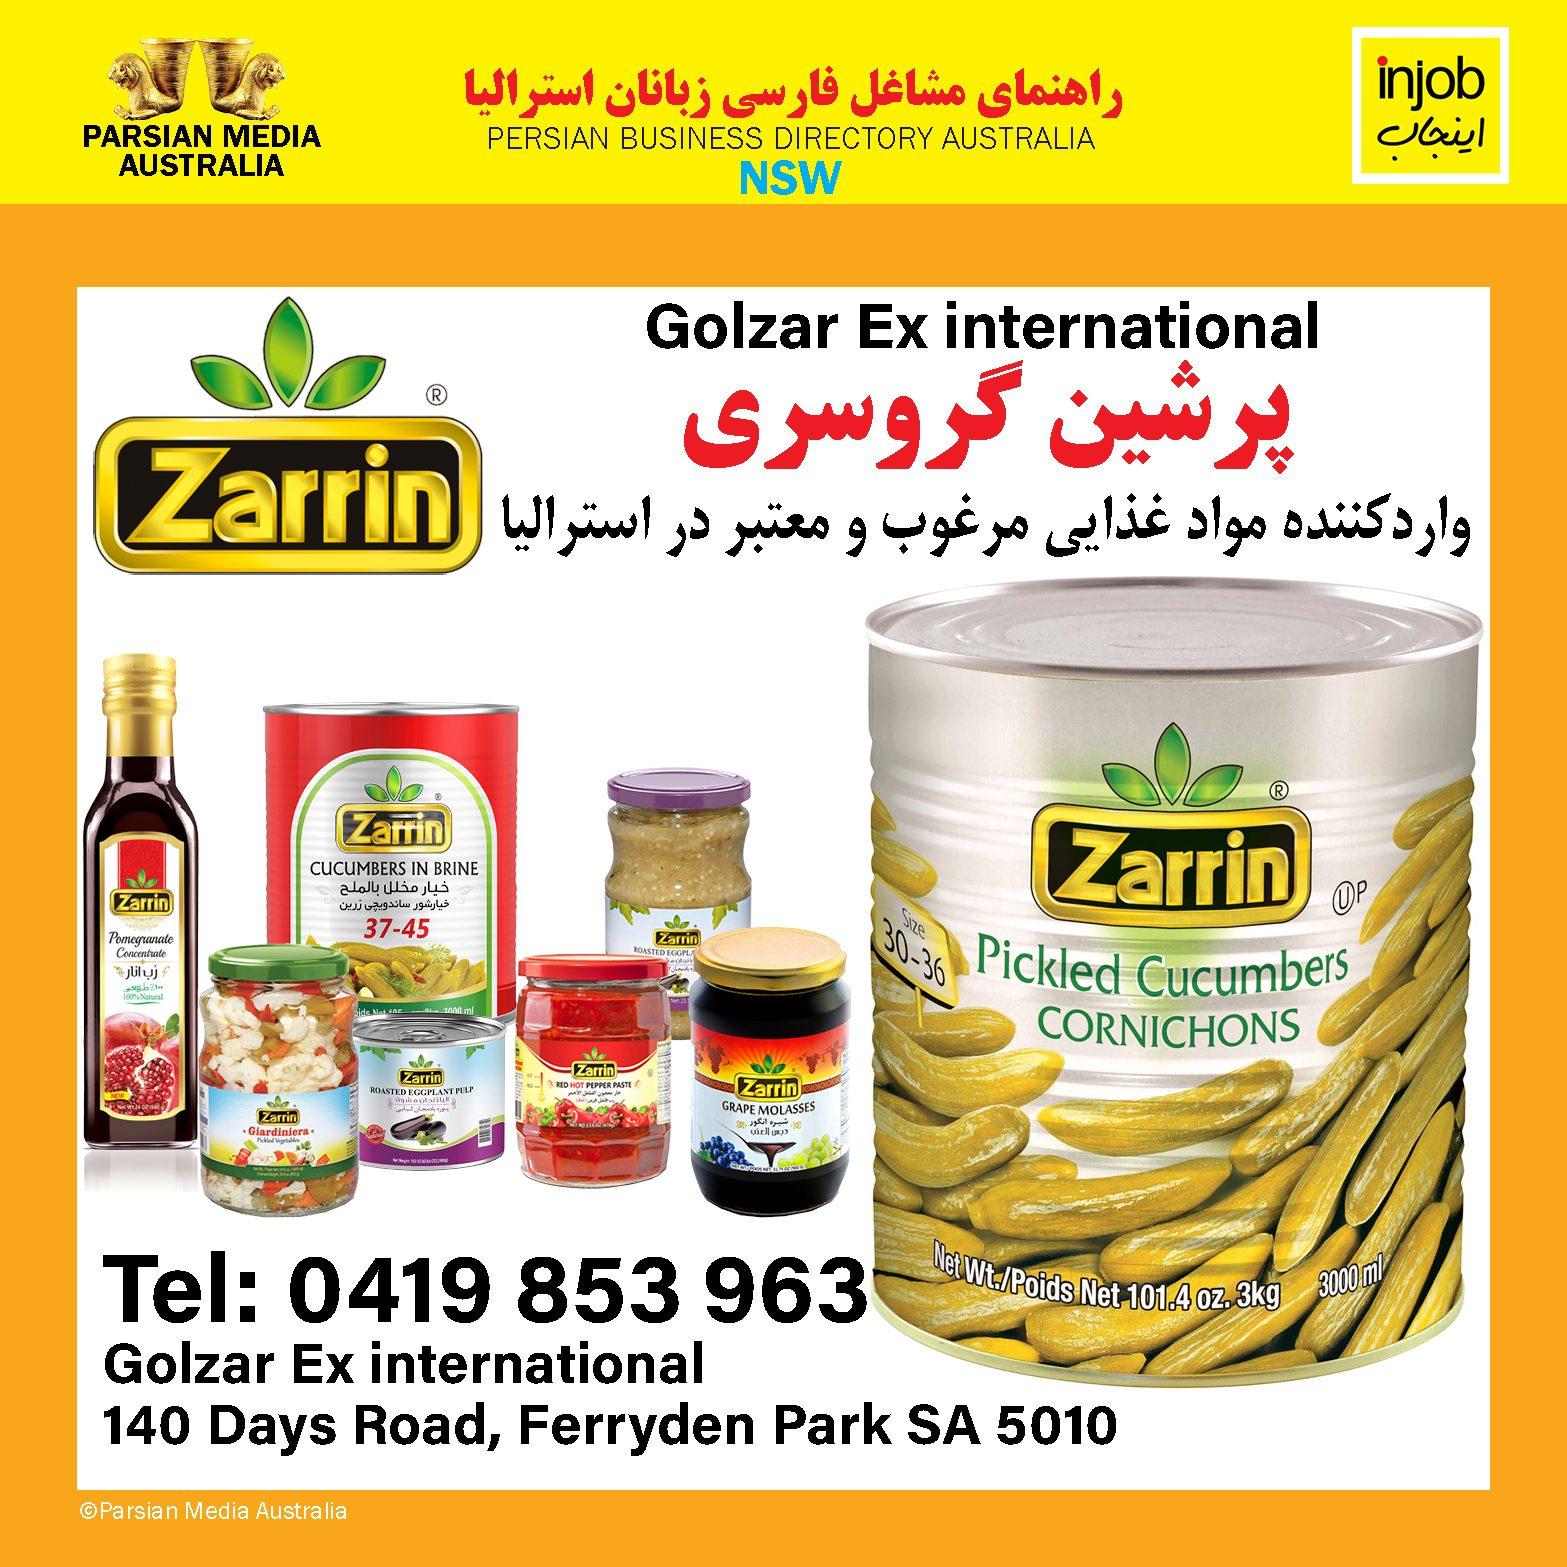 Persian grocery2-AS-Injob-2021-online.jpg